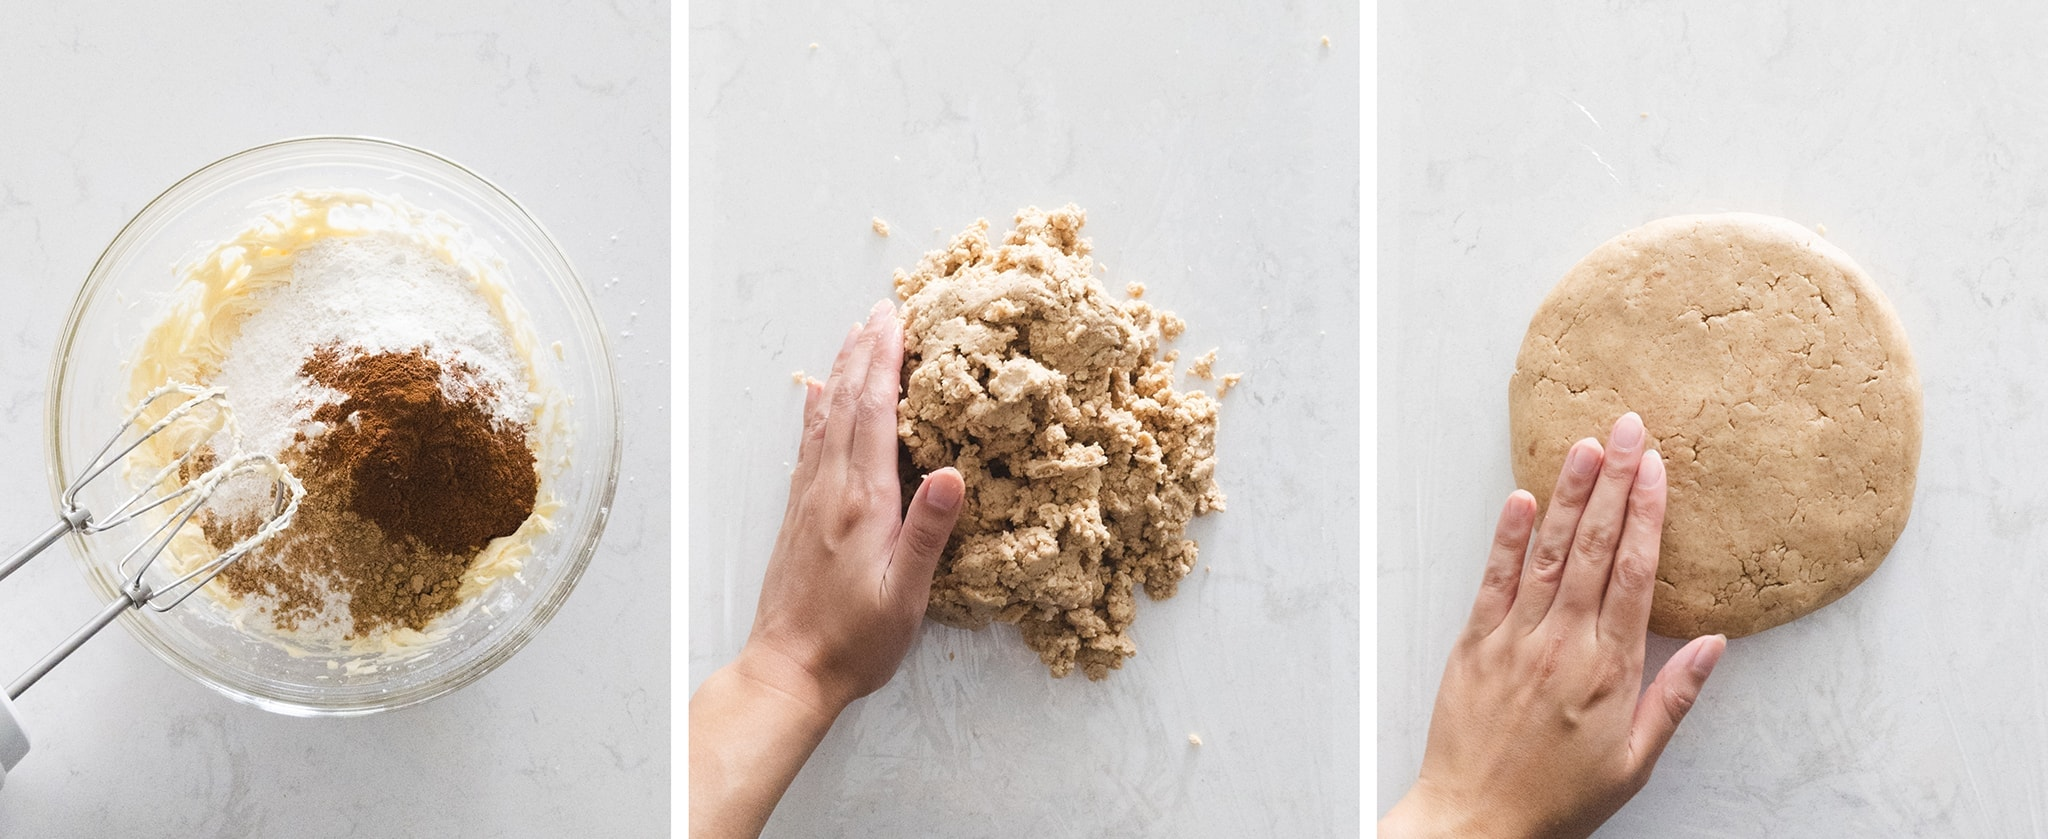 Pressing together tart dough into a disc